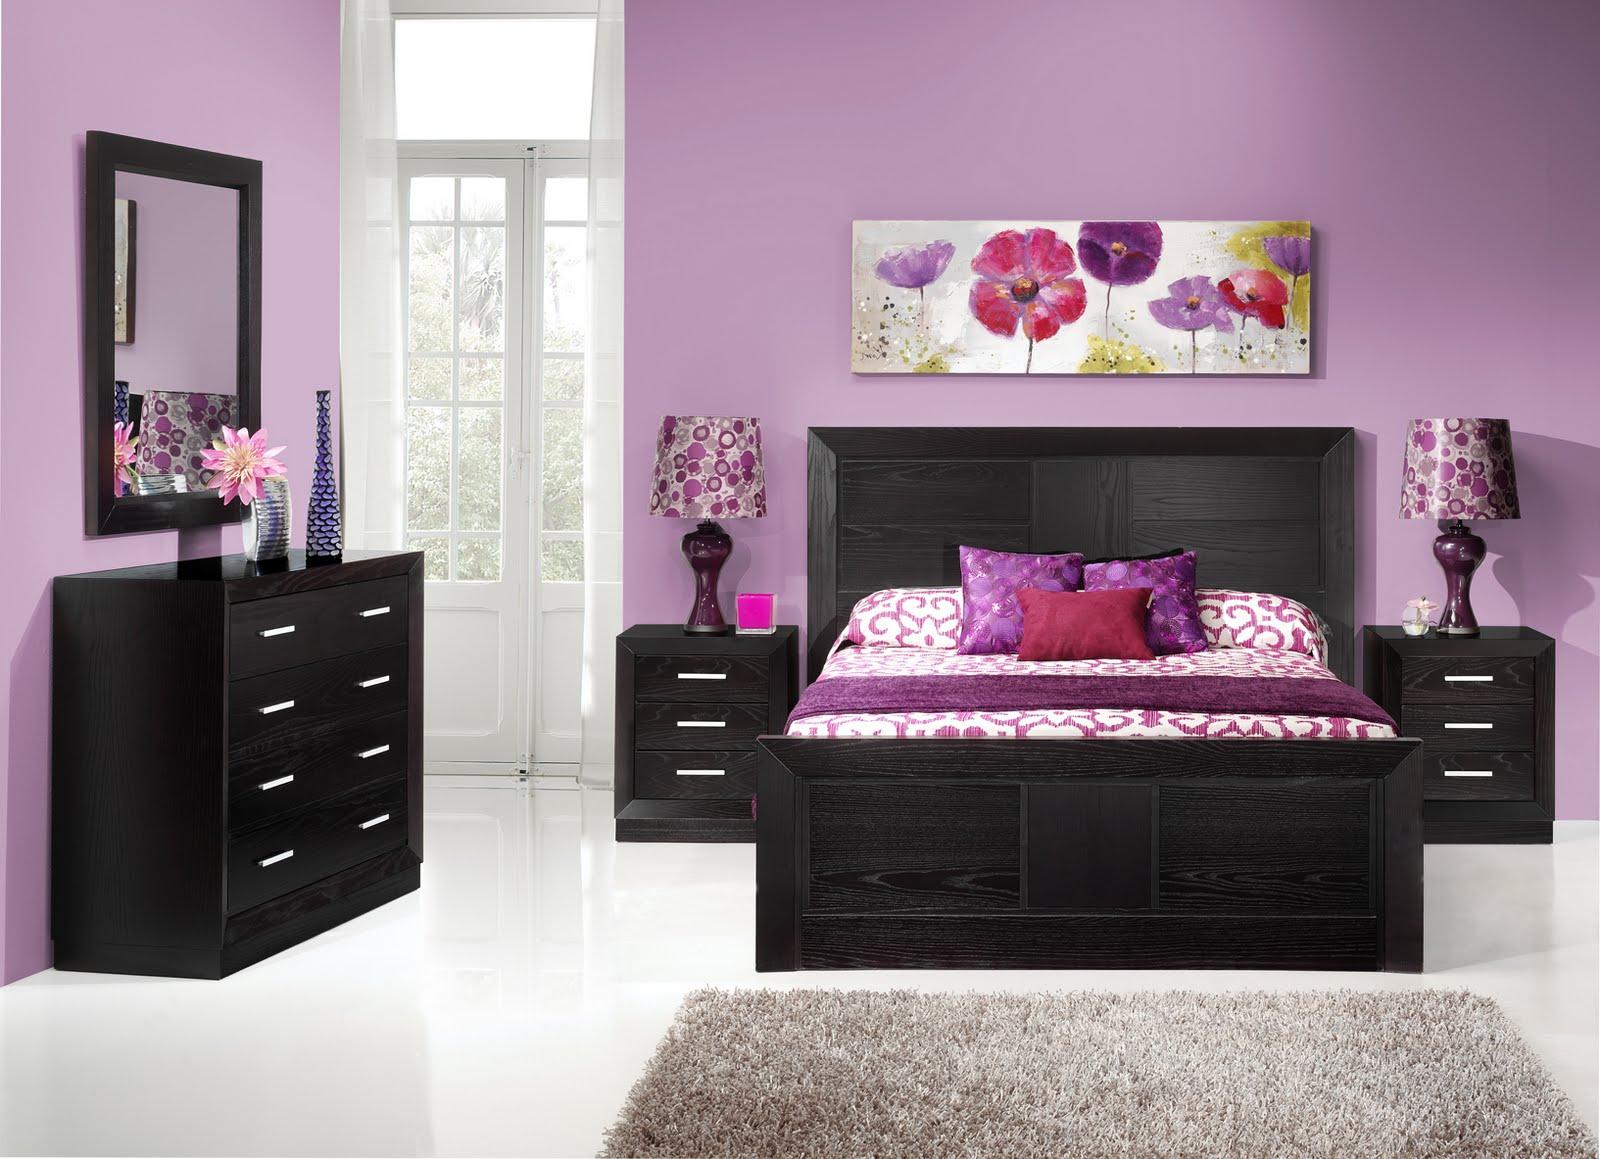 Modelo de dormitorios imagui for Como disenar mi habitacion